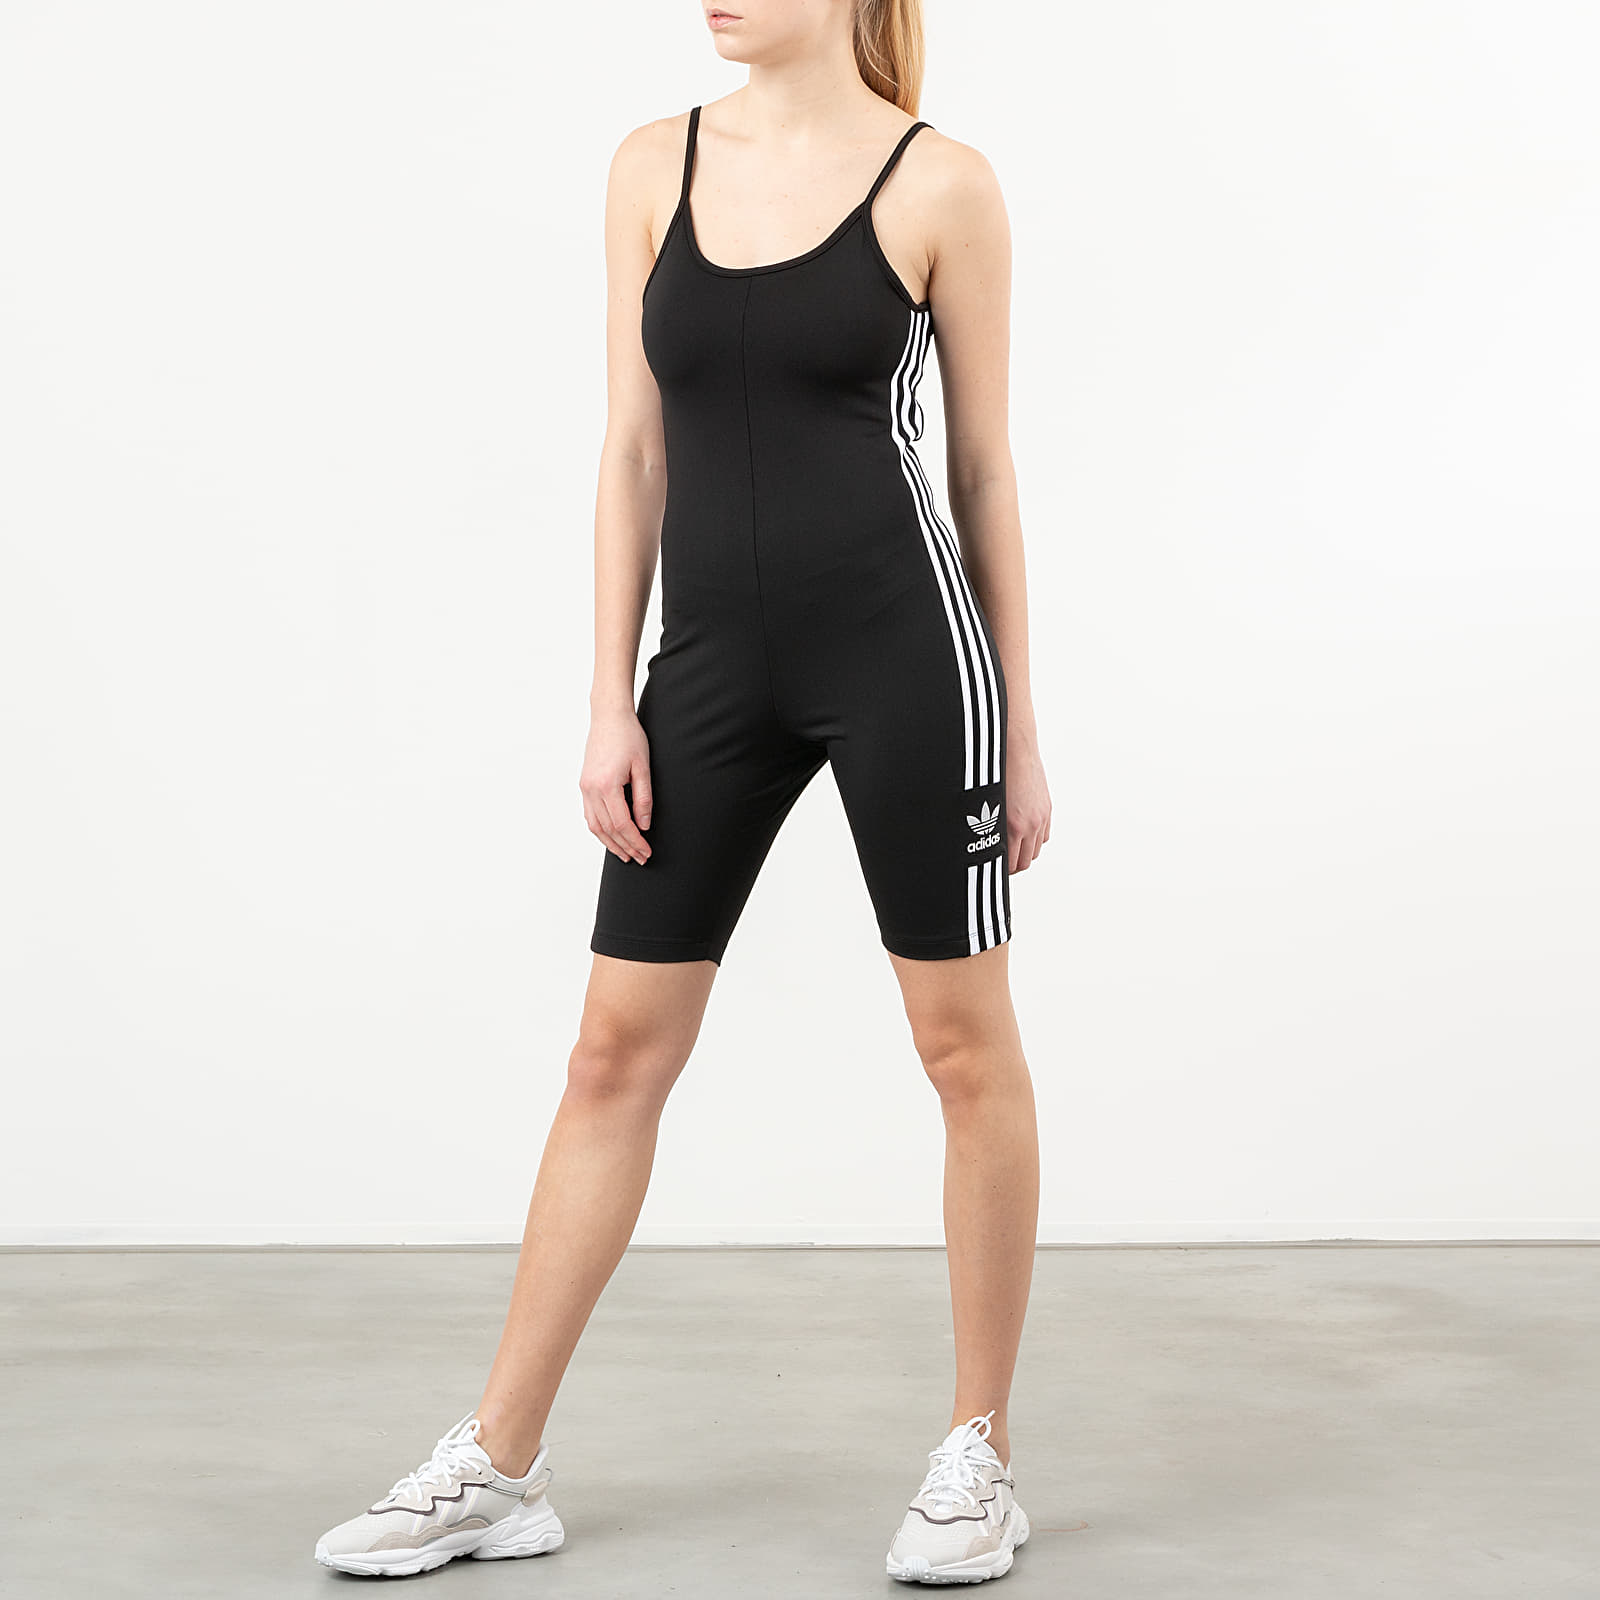 Abbigliamento Donna adidas Cycling Suit Black